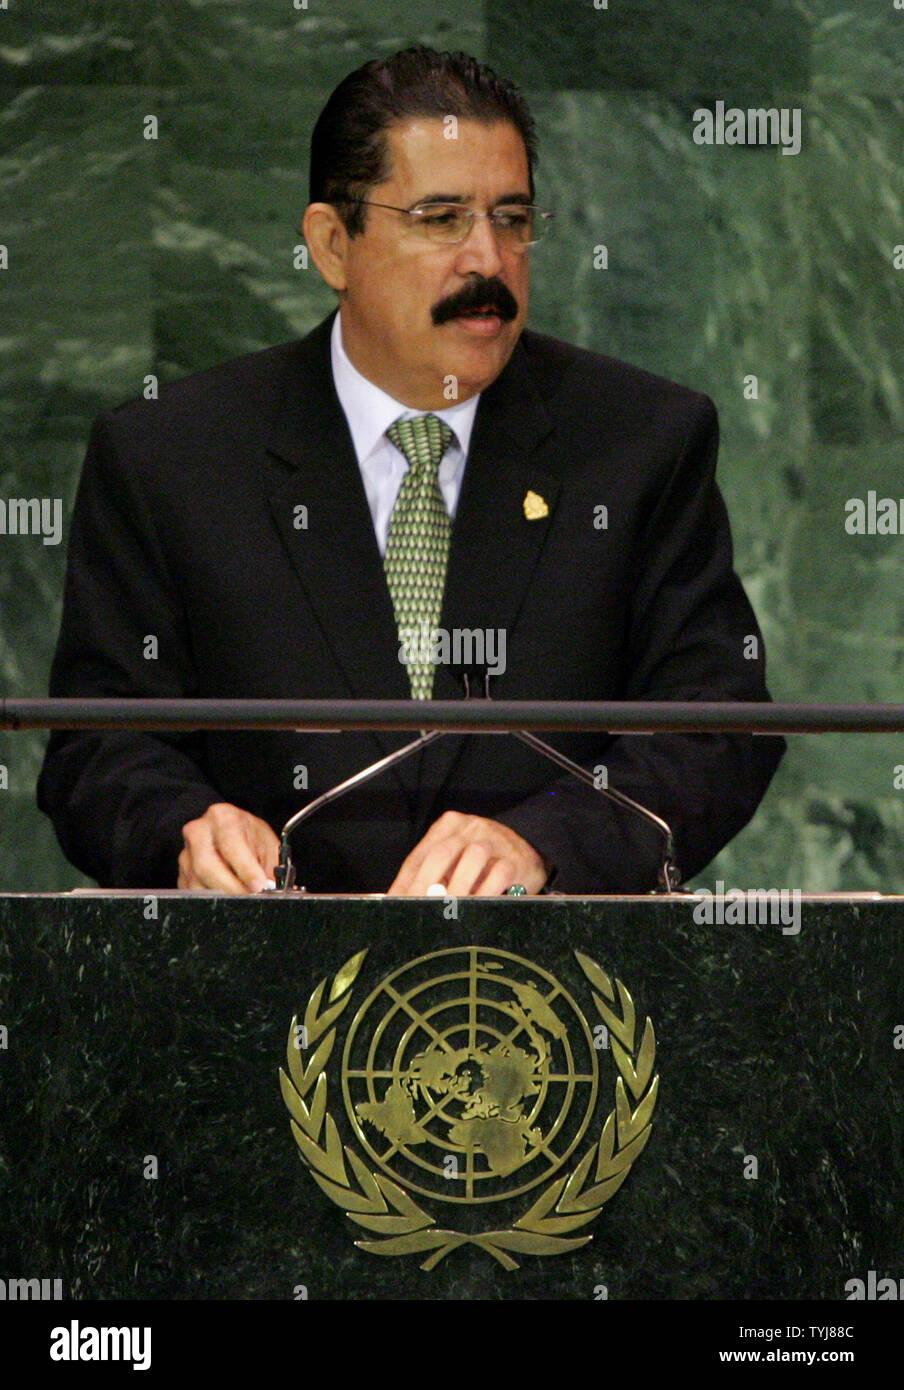 Honduras President Manuel Zelaya Rosales addresses the 62nd General Assembly at the United Nations on September 25, 2007 in New York City. (UPI Photo/Monika Graff) Stock Photo